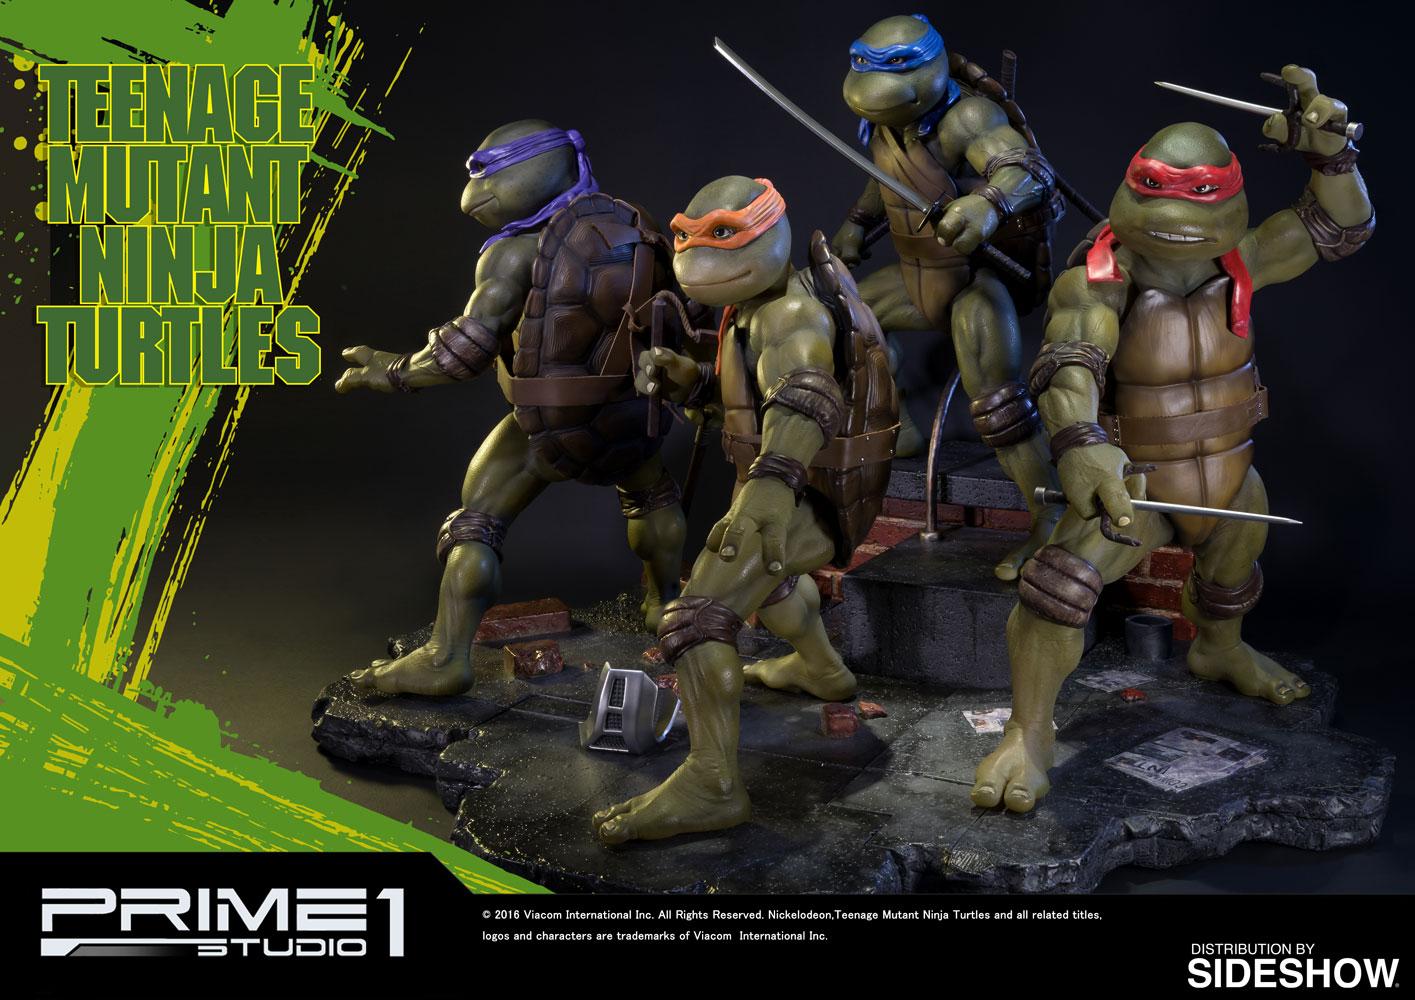 STATUE Prime 1 Studio - 1/4 Scale - 90u0027s Teenage Mutant Ninja Turtles [Archive] - Sideshow Freaks & STATUE Prime 1 Studio - 1/4 Scale - 90u0027s Teenage Mutant Ninja ...